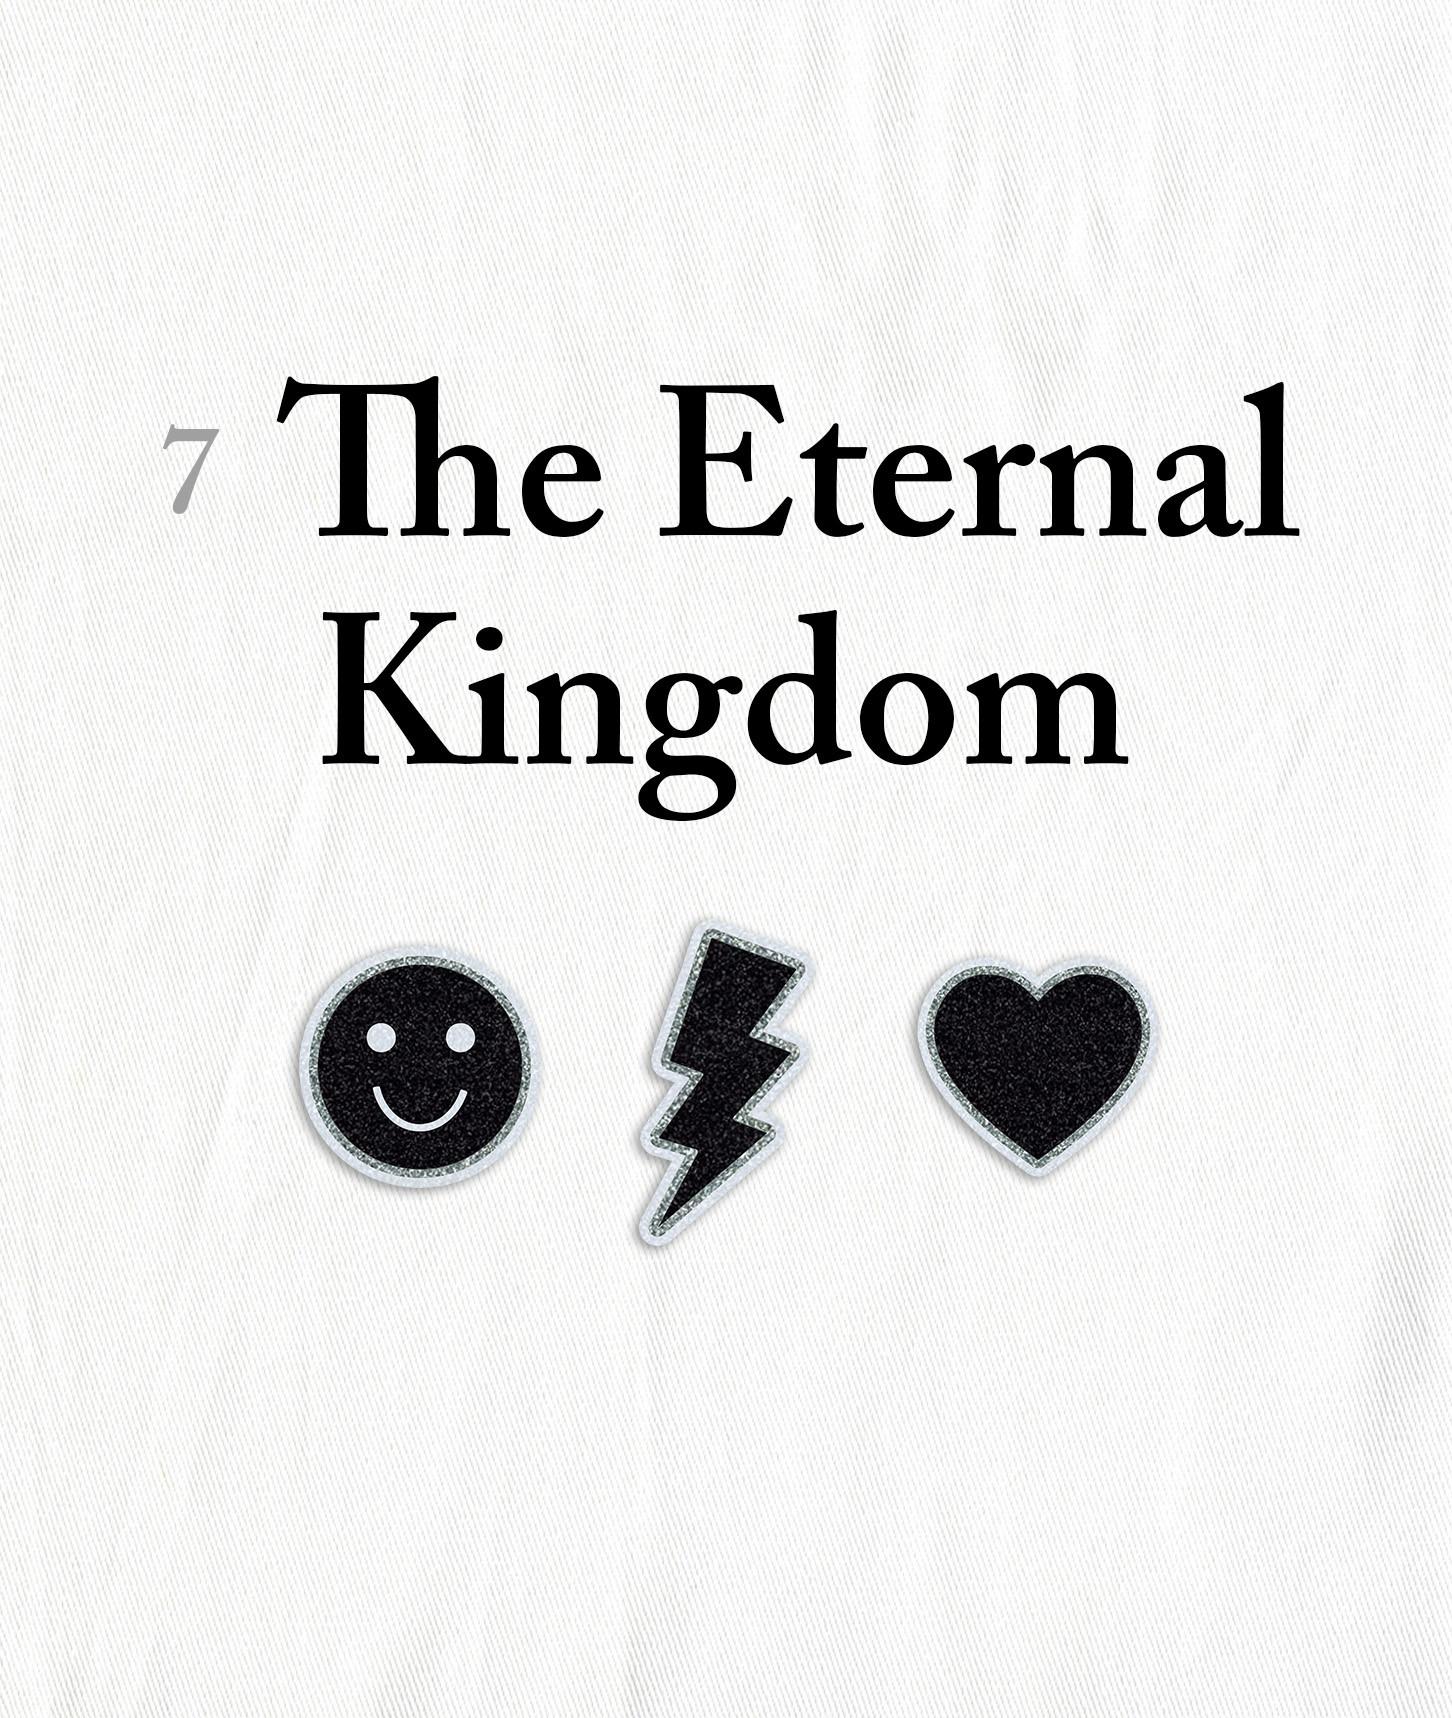 kingdom7.jpg